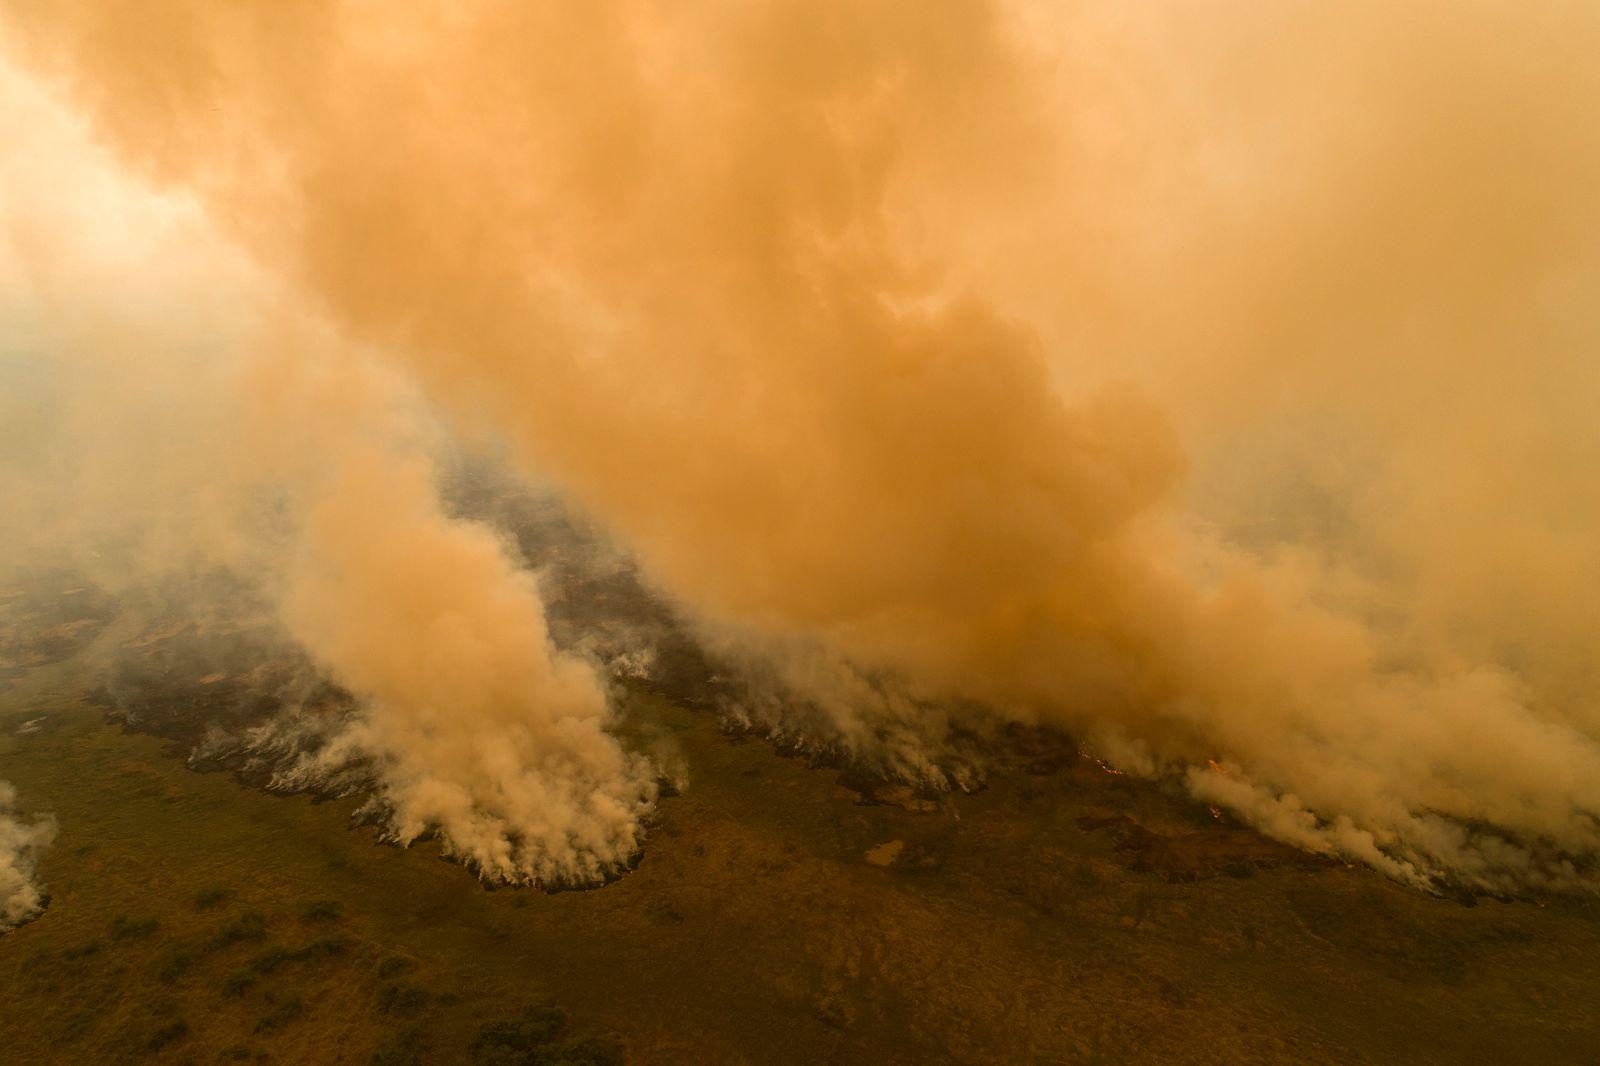 Brazil Pantanal Wildfires